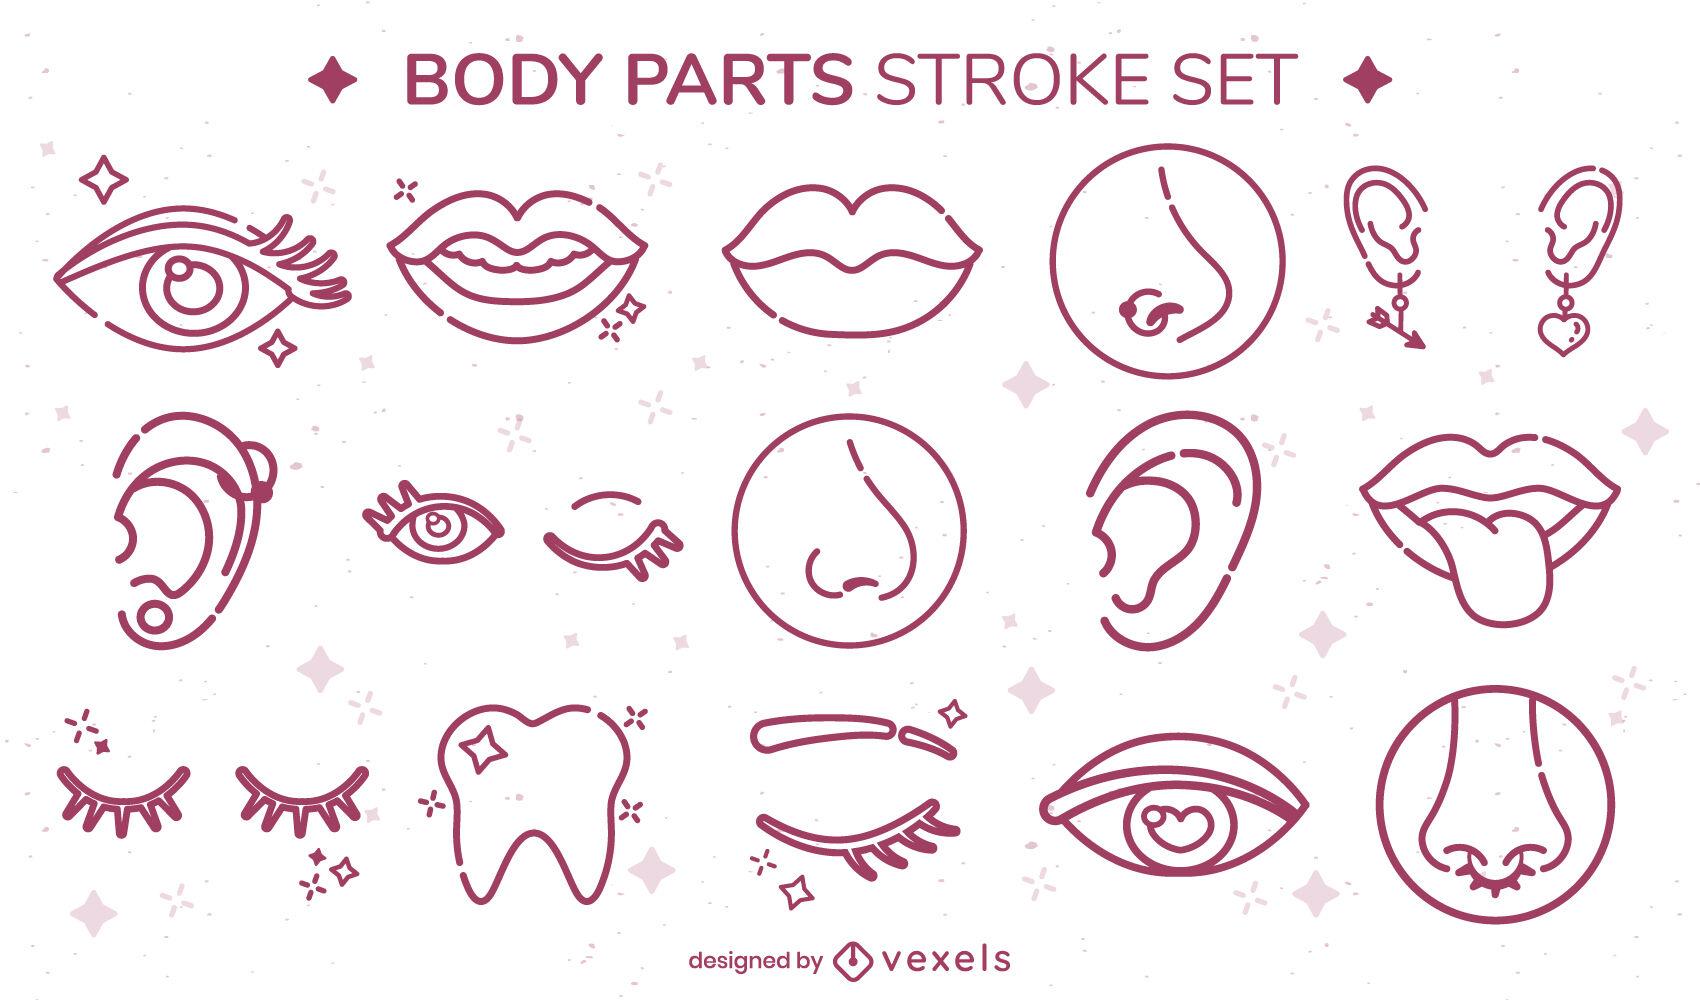 Sparkly face parts stroke set